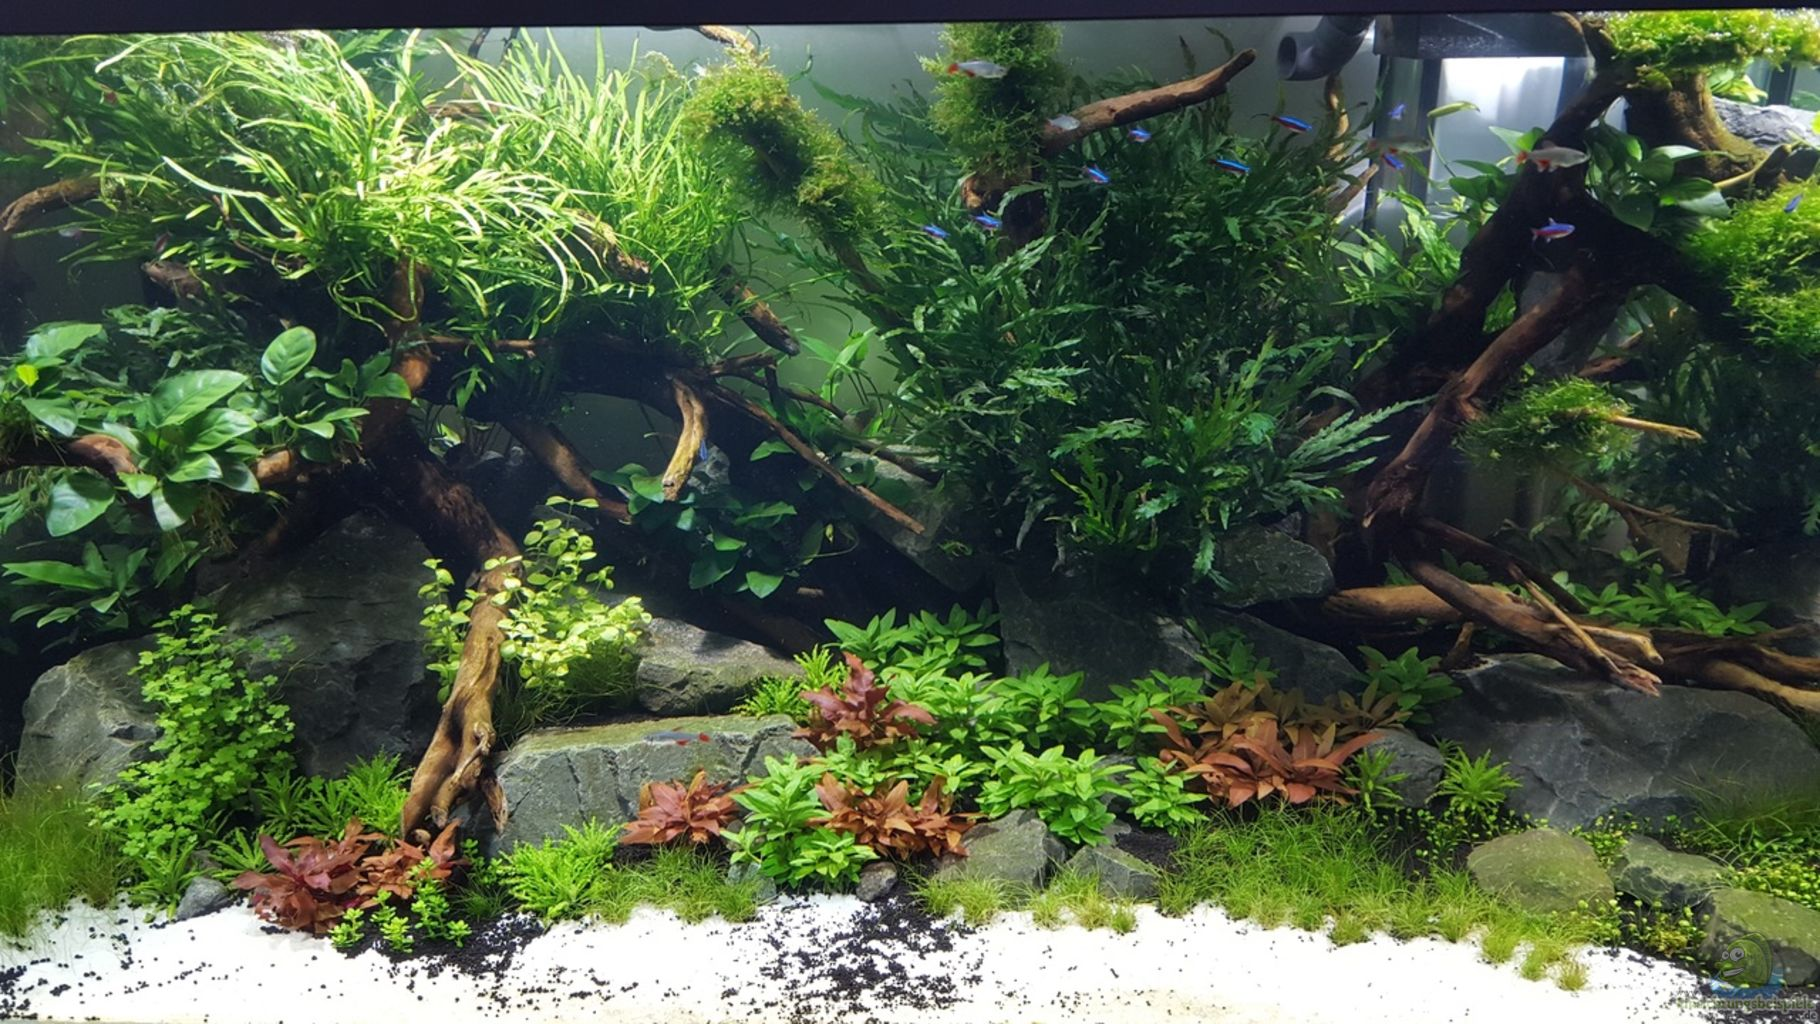 ... chosen for the Tropica Aquarium Soil and Tropica Aquarium Soil Powder